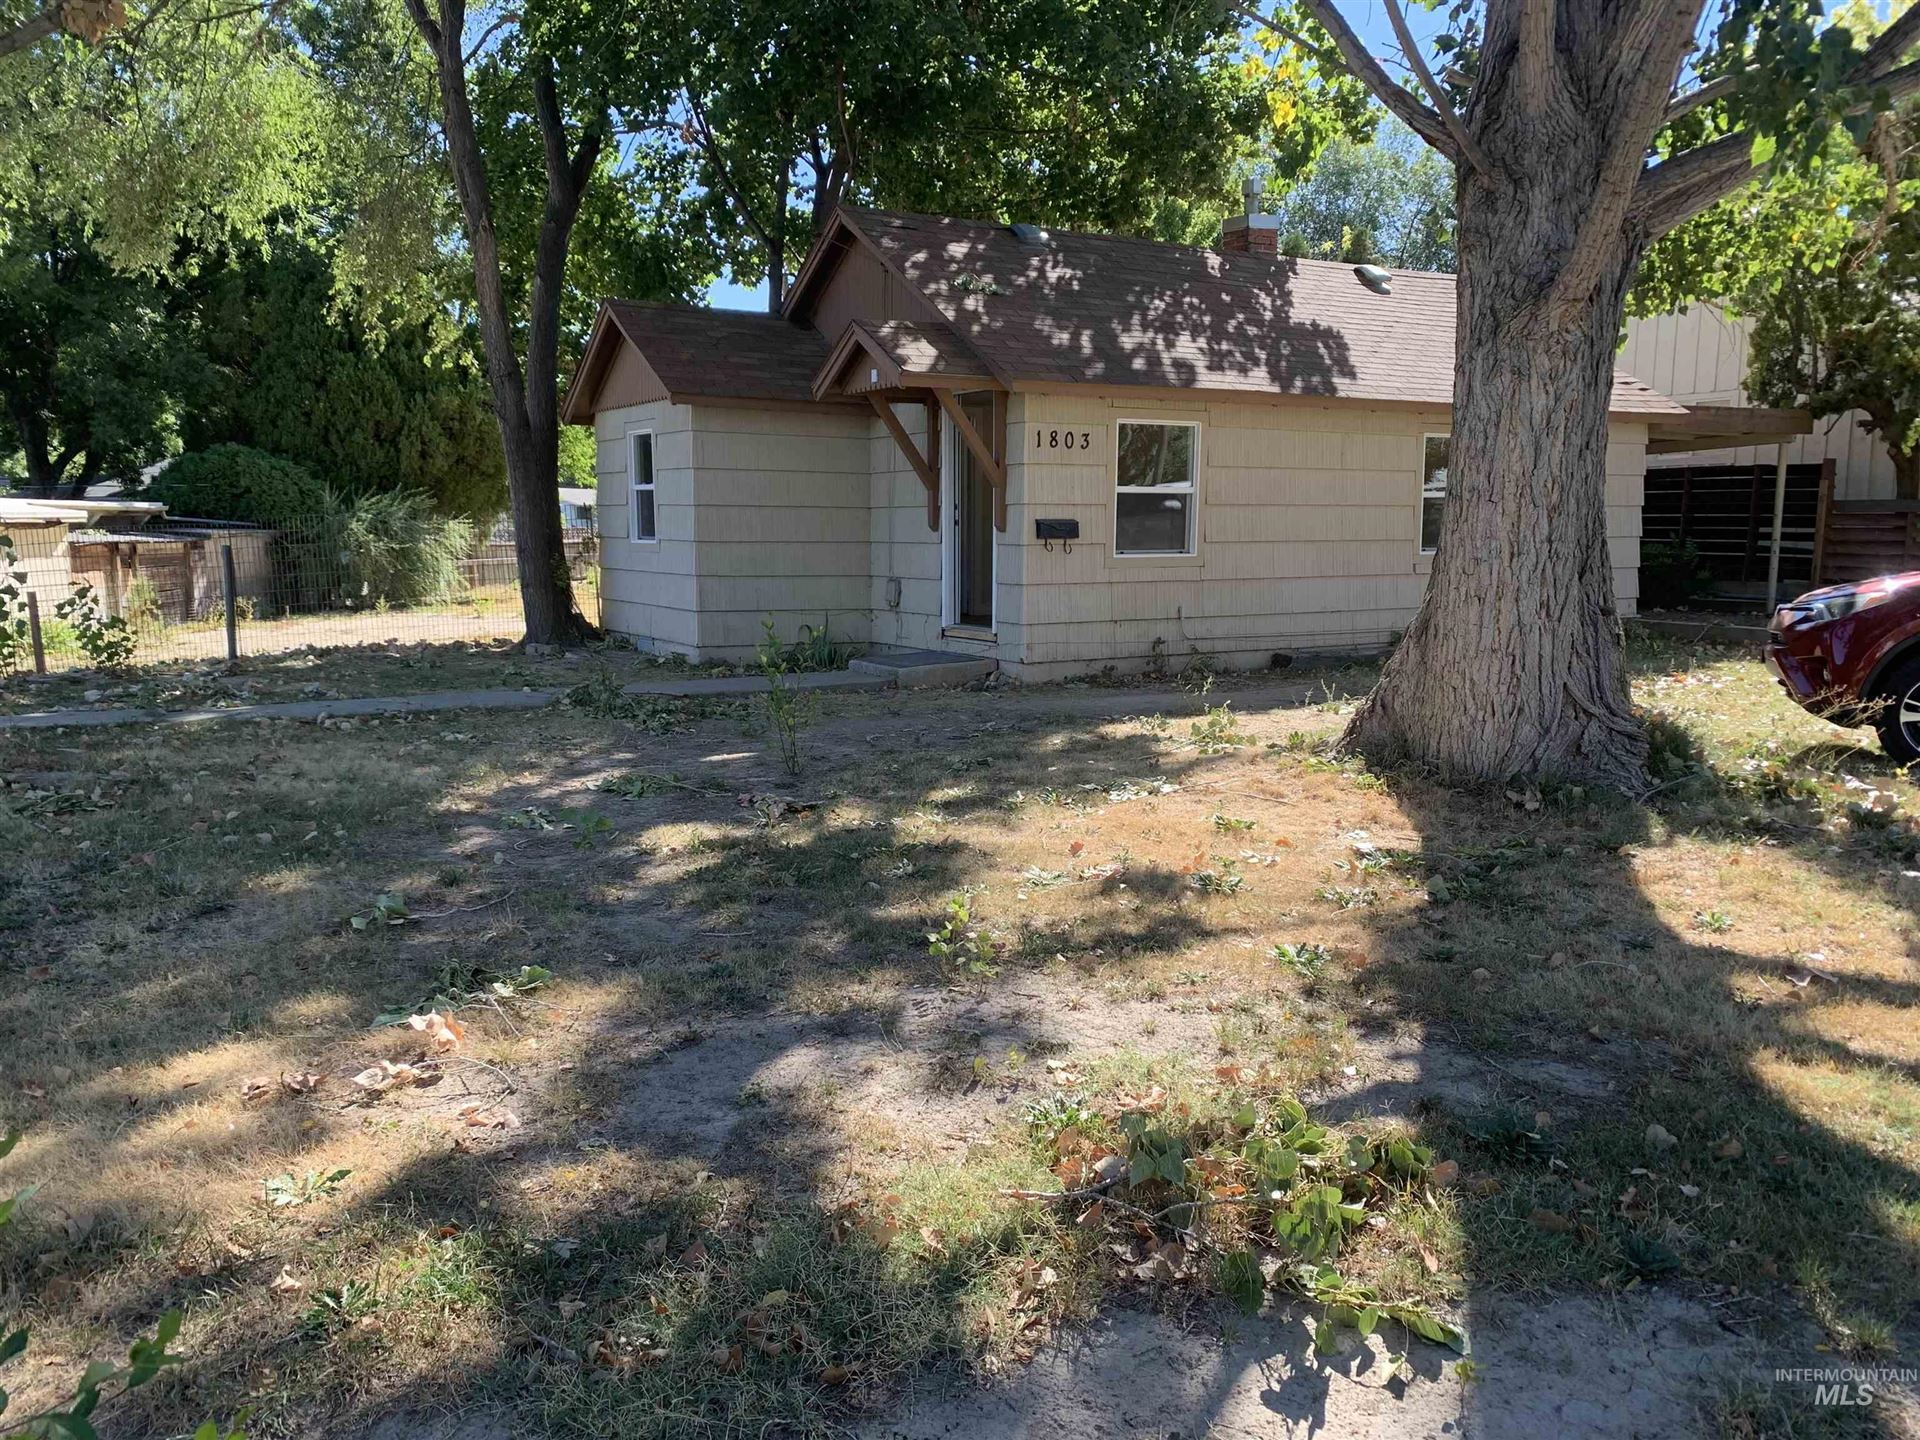 1803 S Montana Ave, Caldwell, ID 83605 - MLS#: 98819692